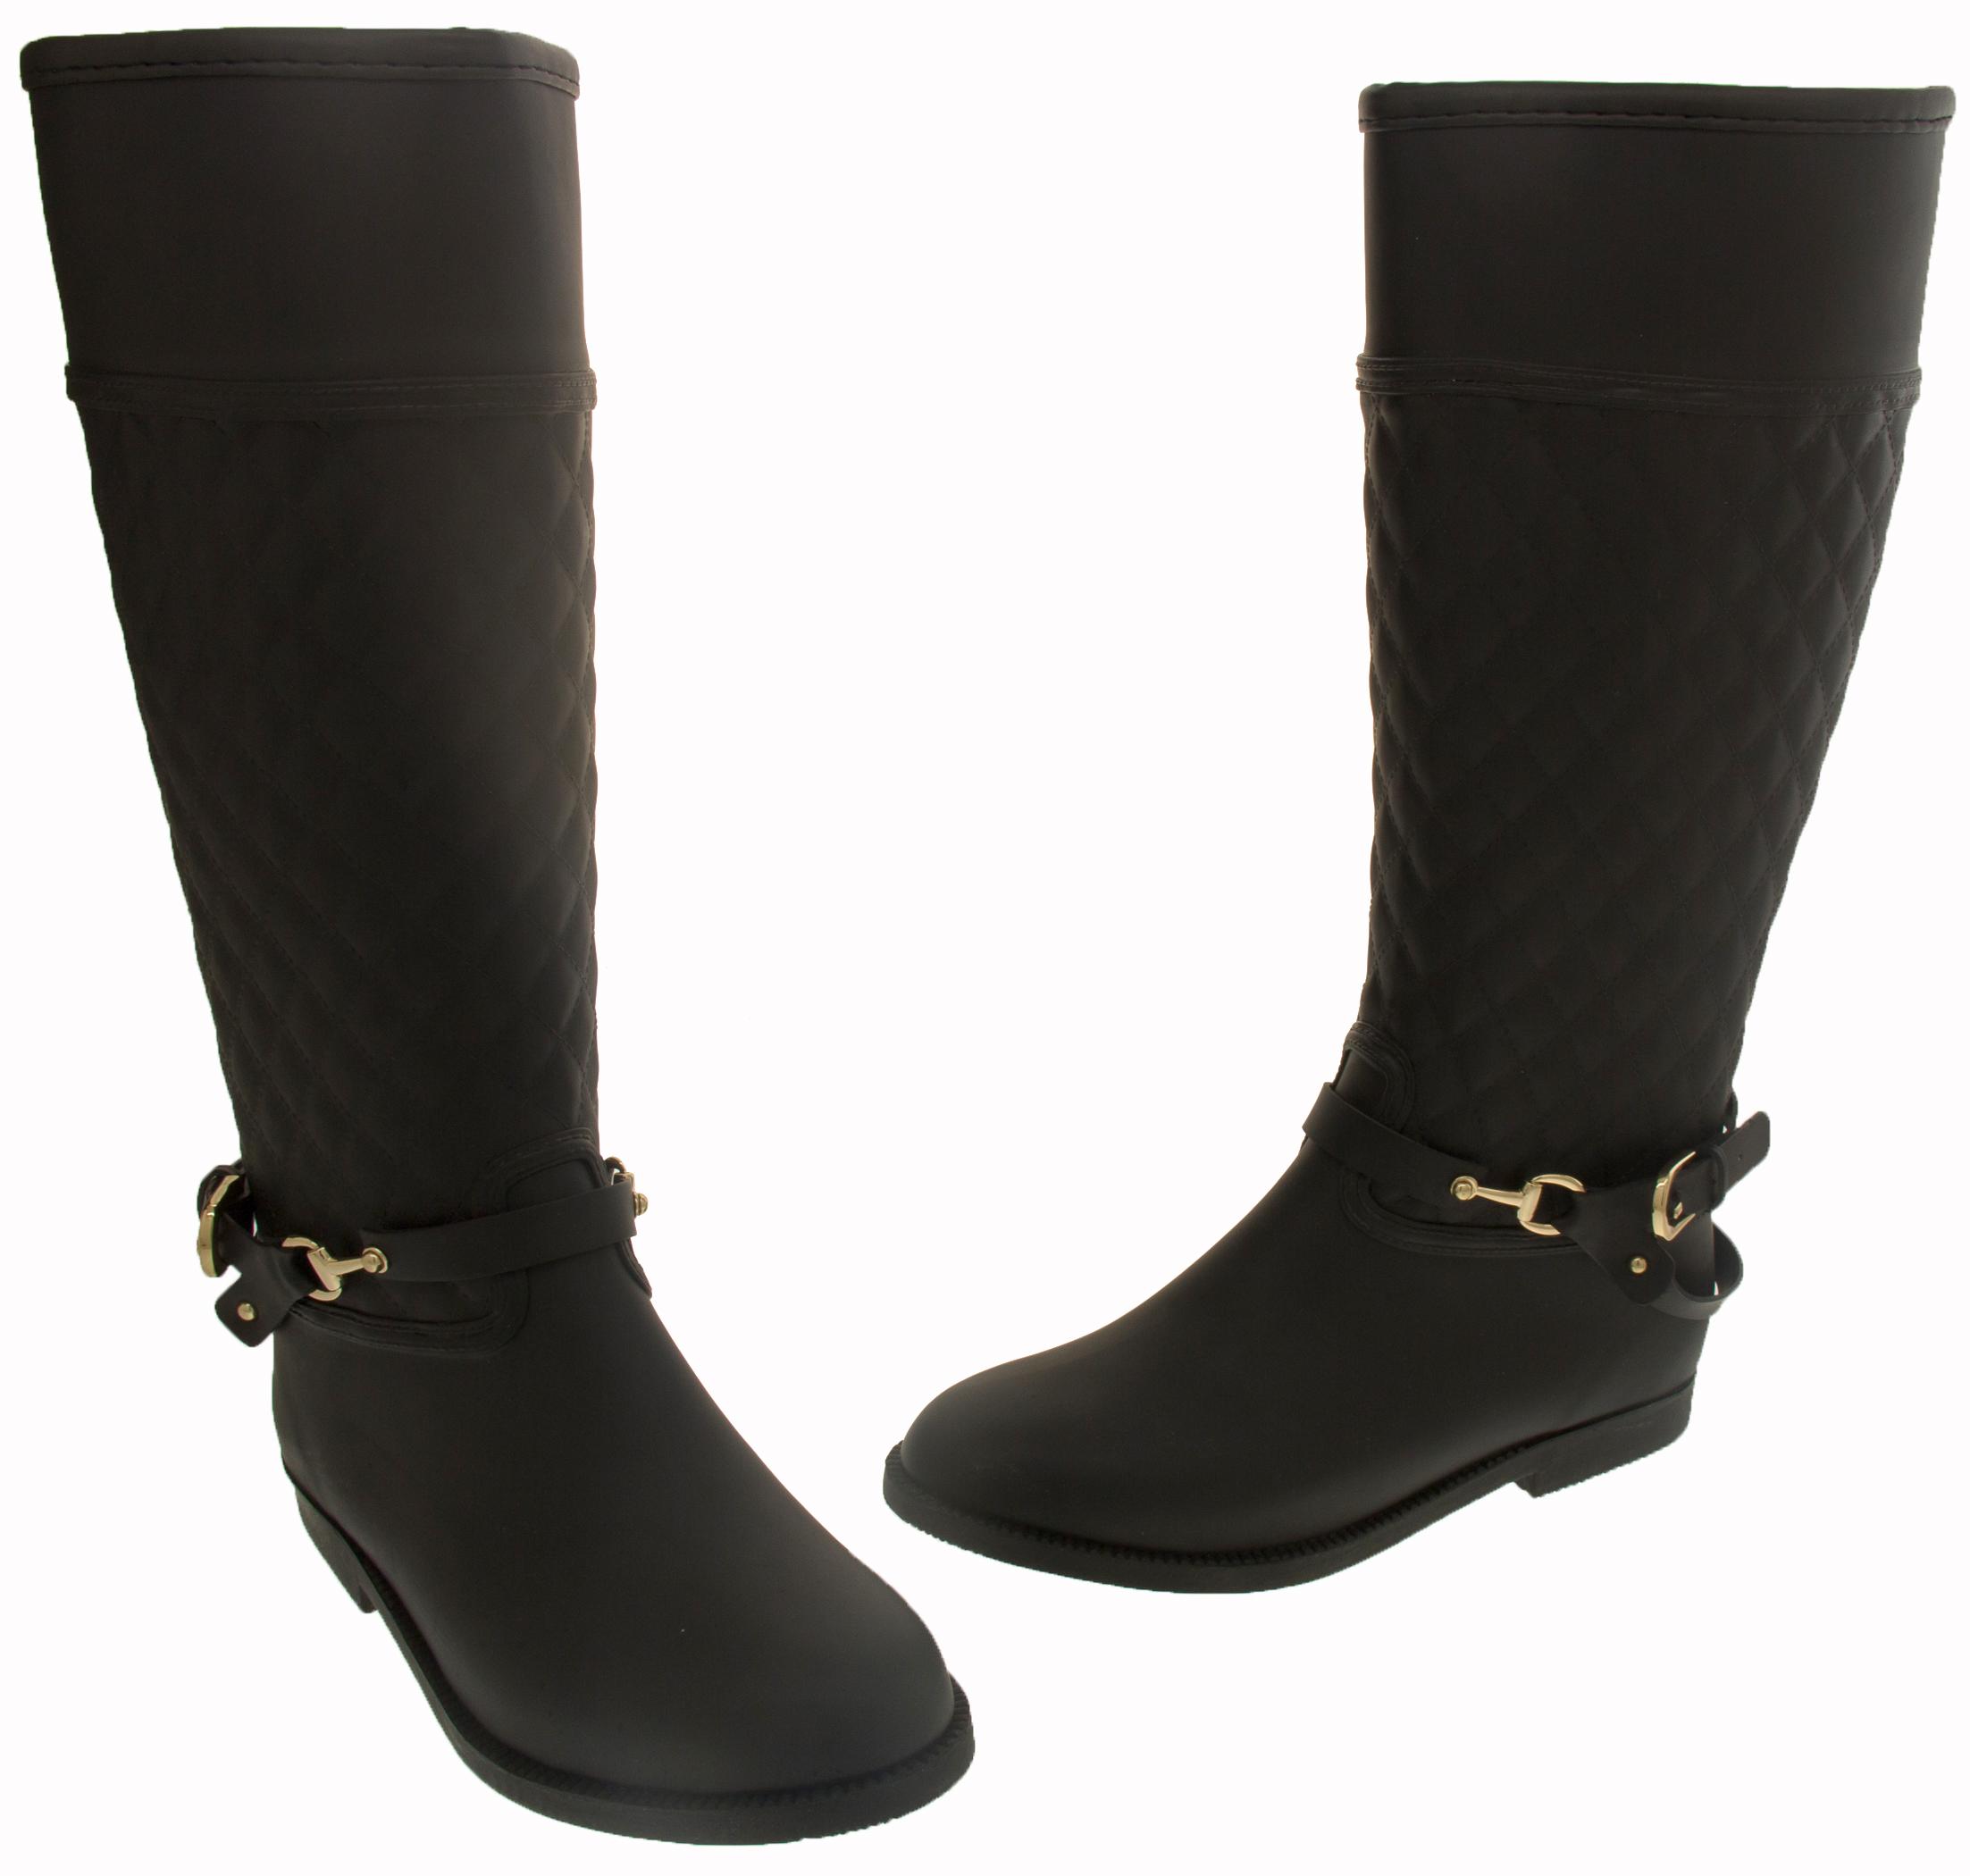 Simple Sunville Womenu0026#39;s Stylish Rain Boots Waterproof - Walmart.com